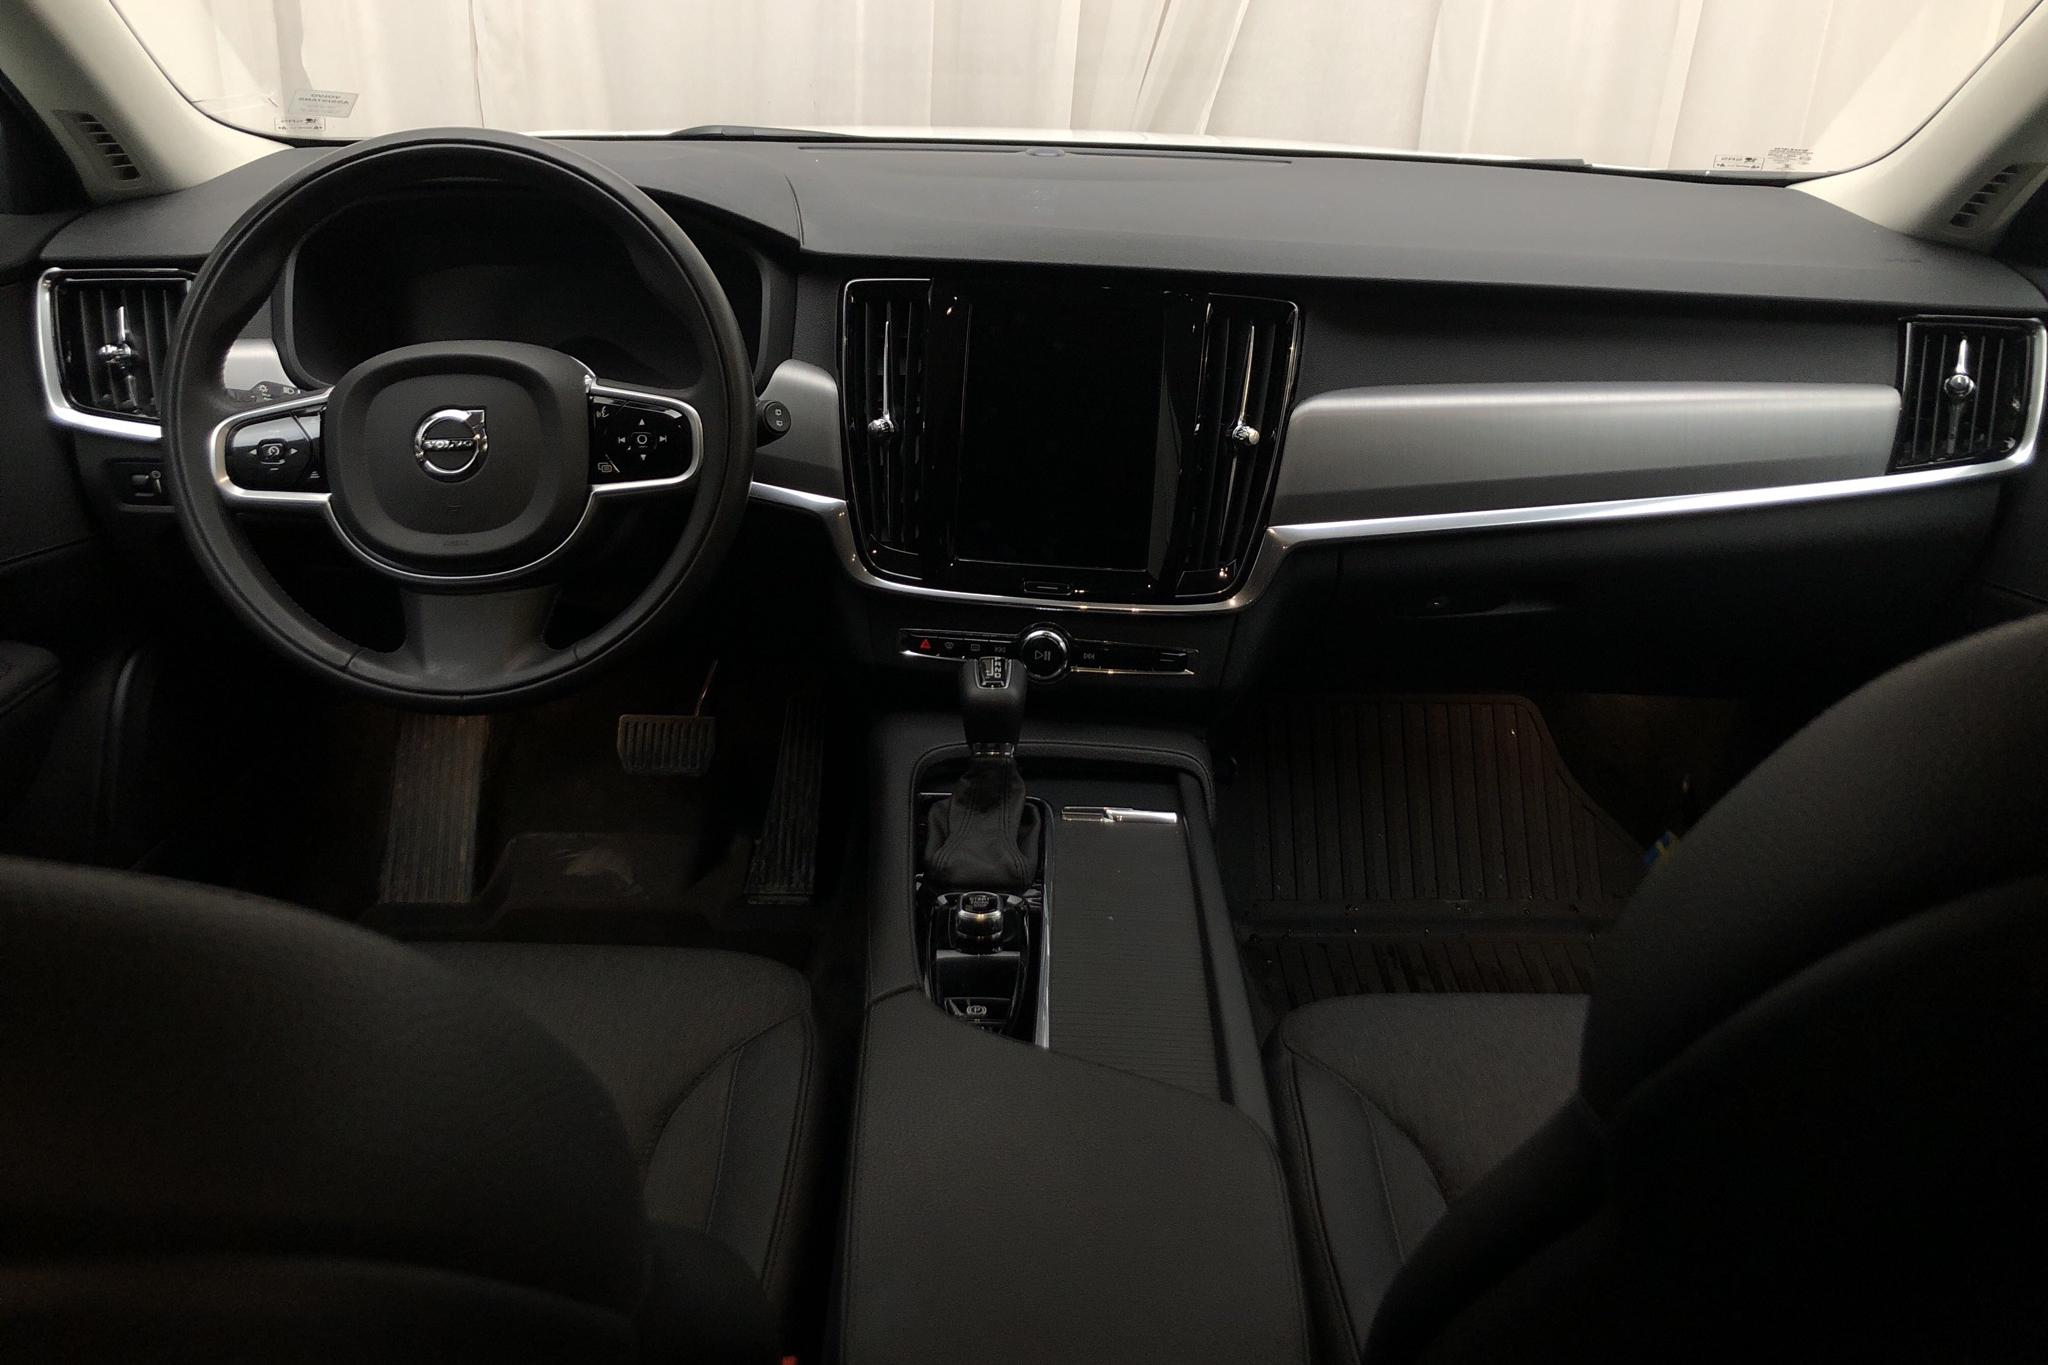 Volvo V90 D4 AWD (190hk) - 2 873 mil - Automat - vit - 2020